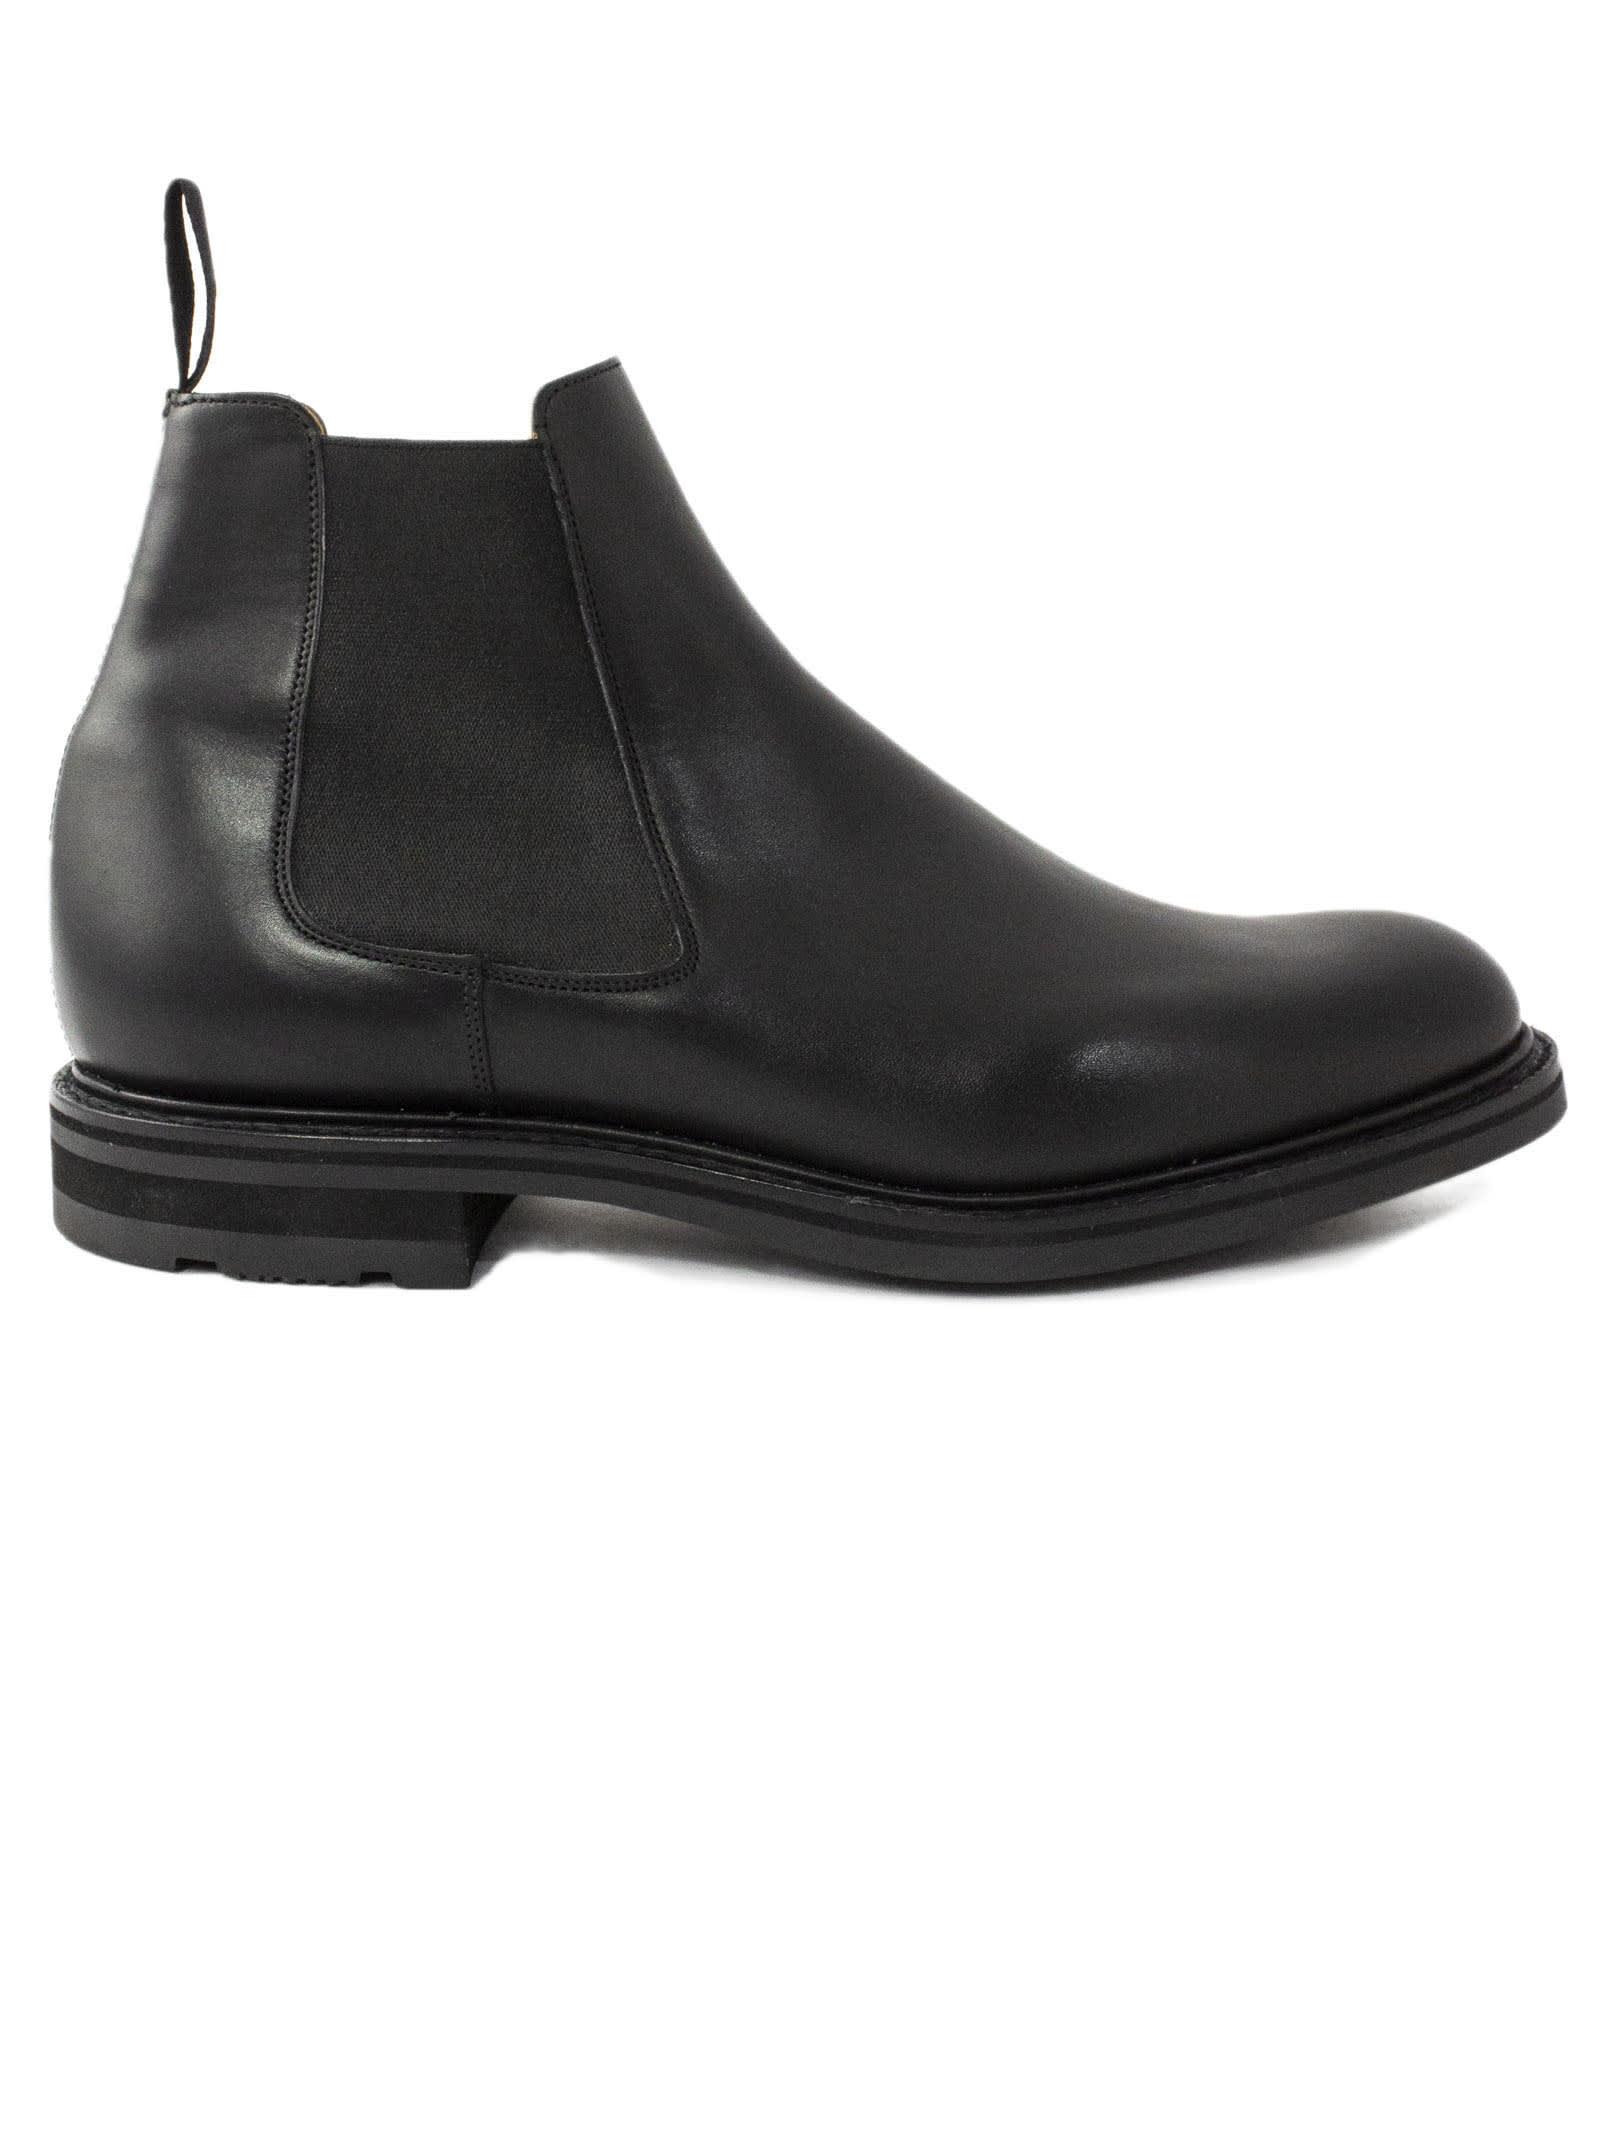 Churchs Welwyn Black Chelsea Boot